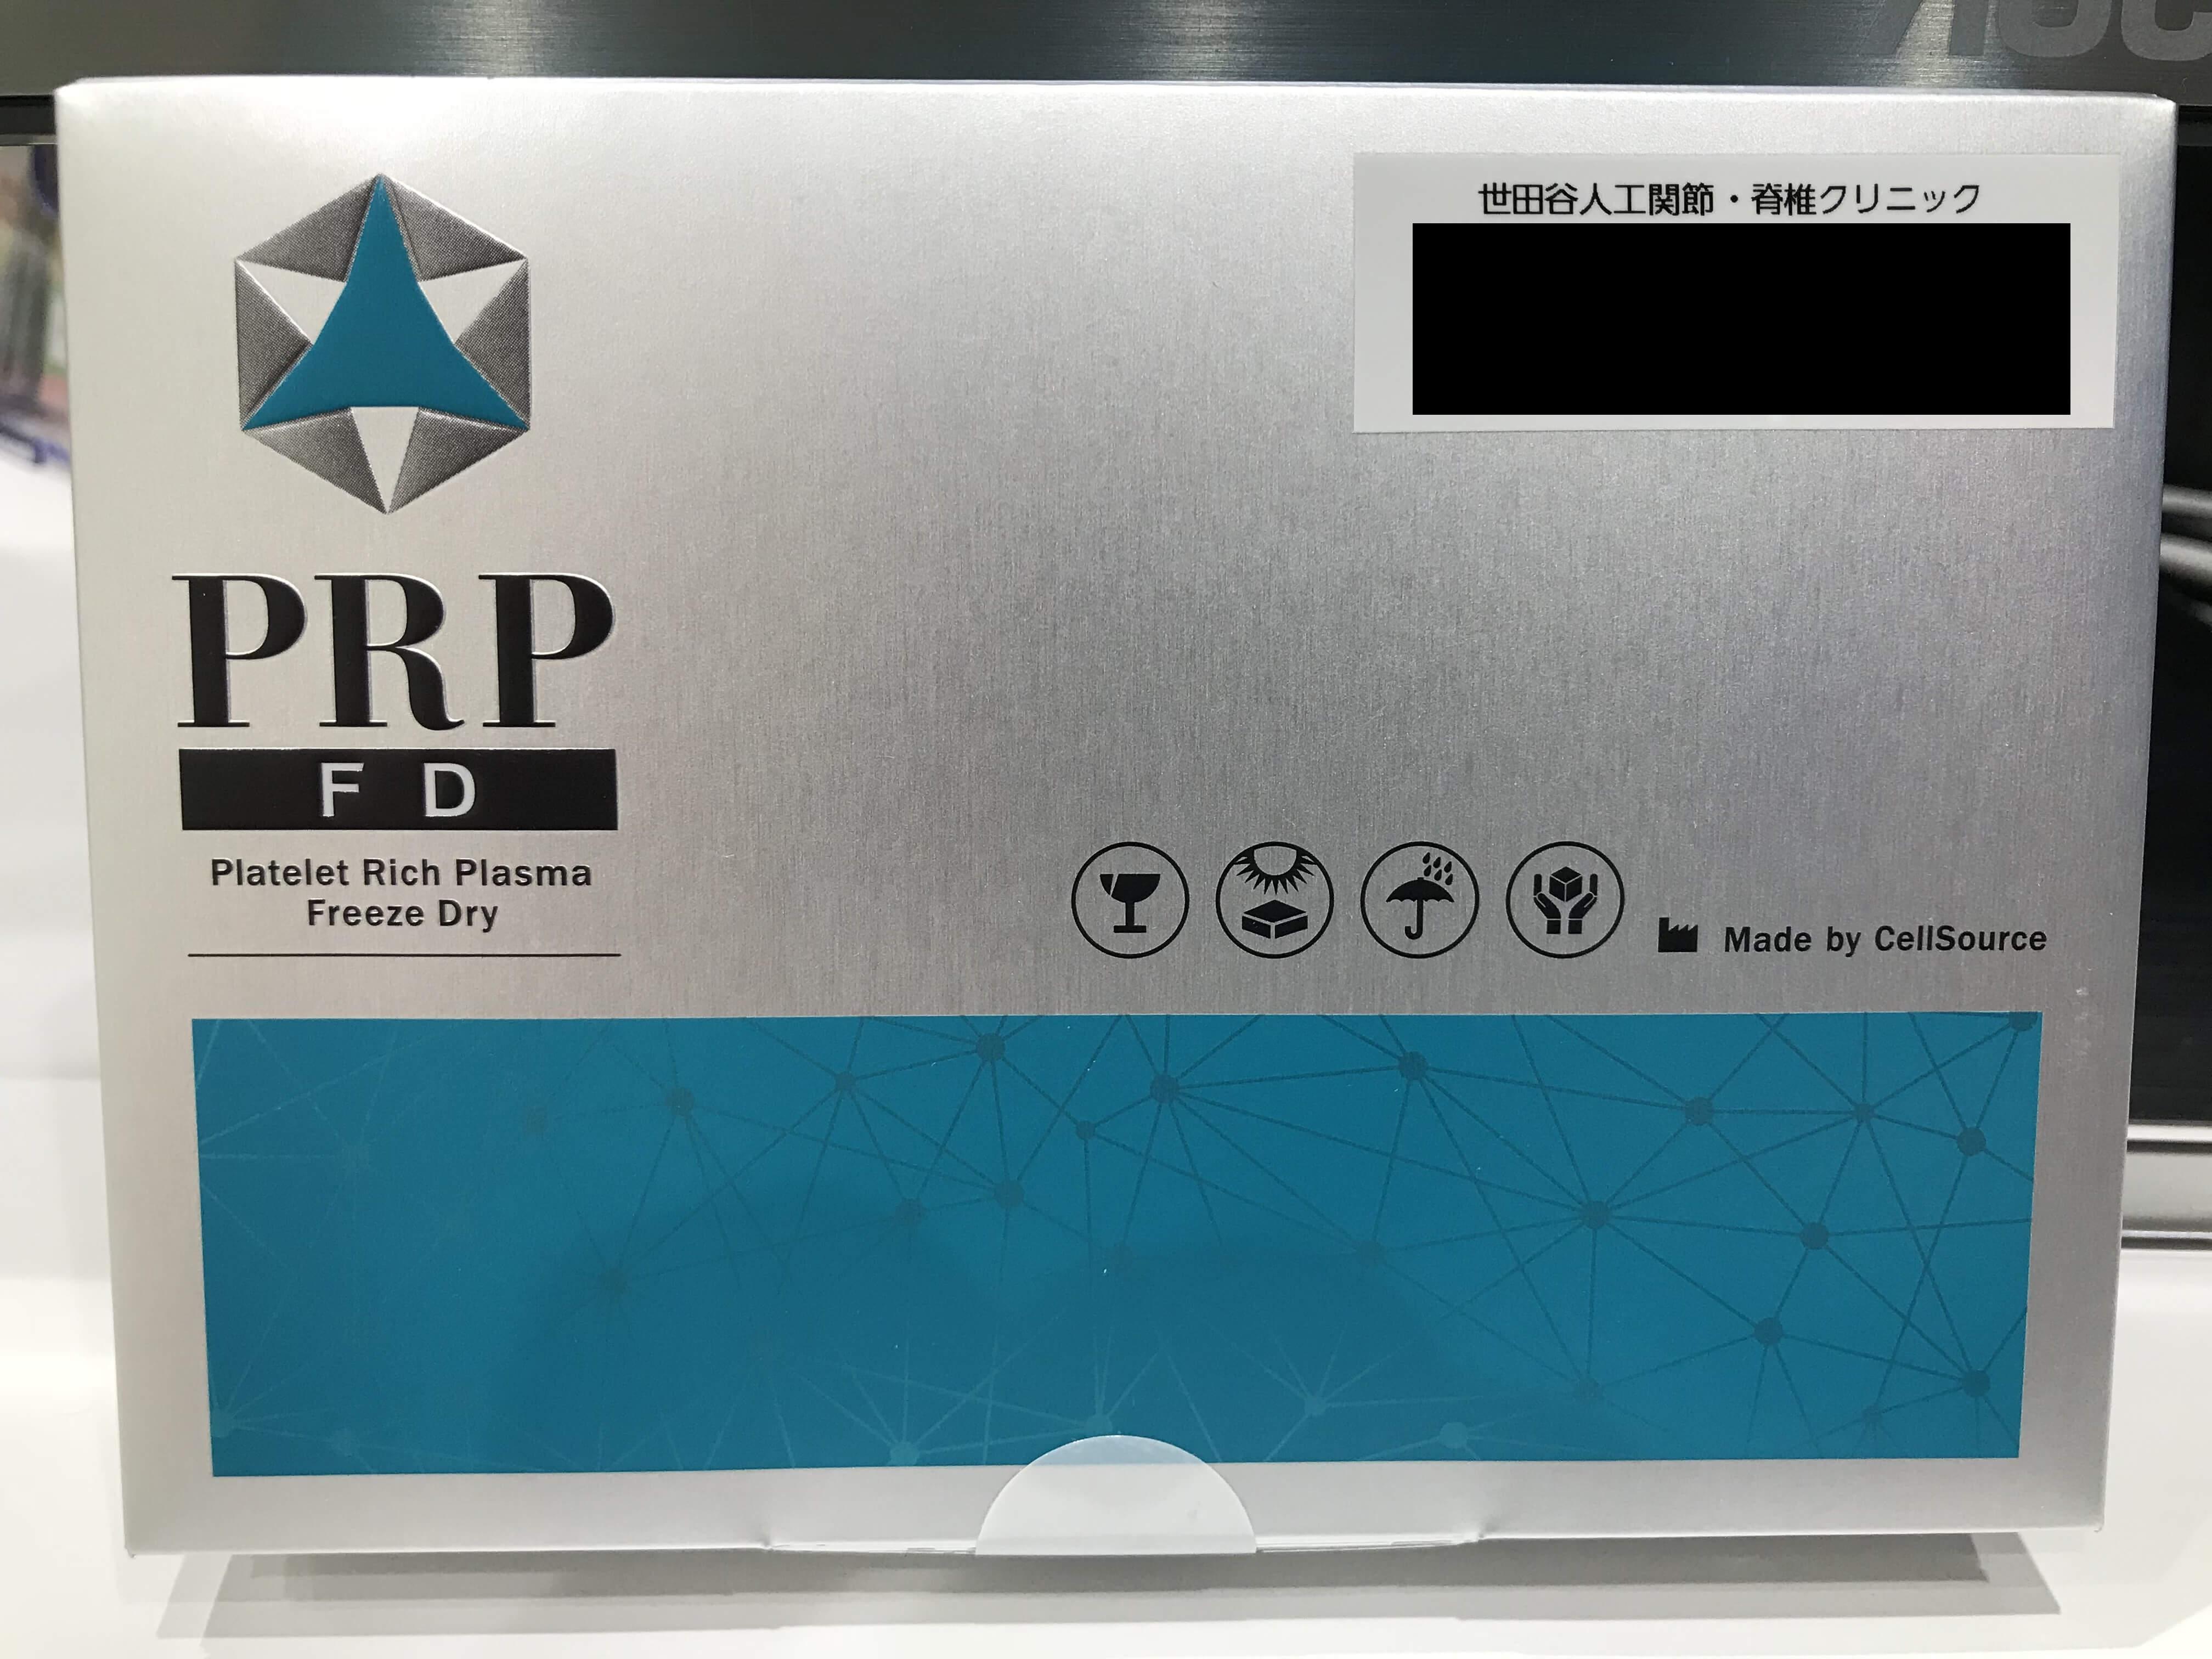 変形性膝関節症とPRP-FD注射